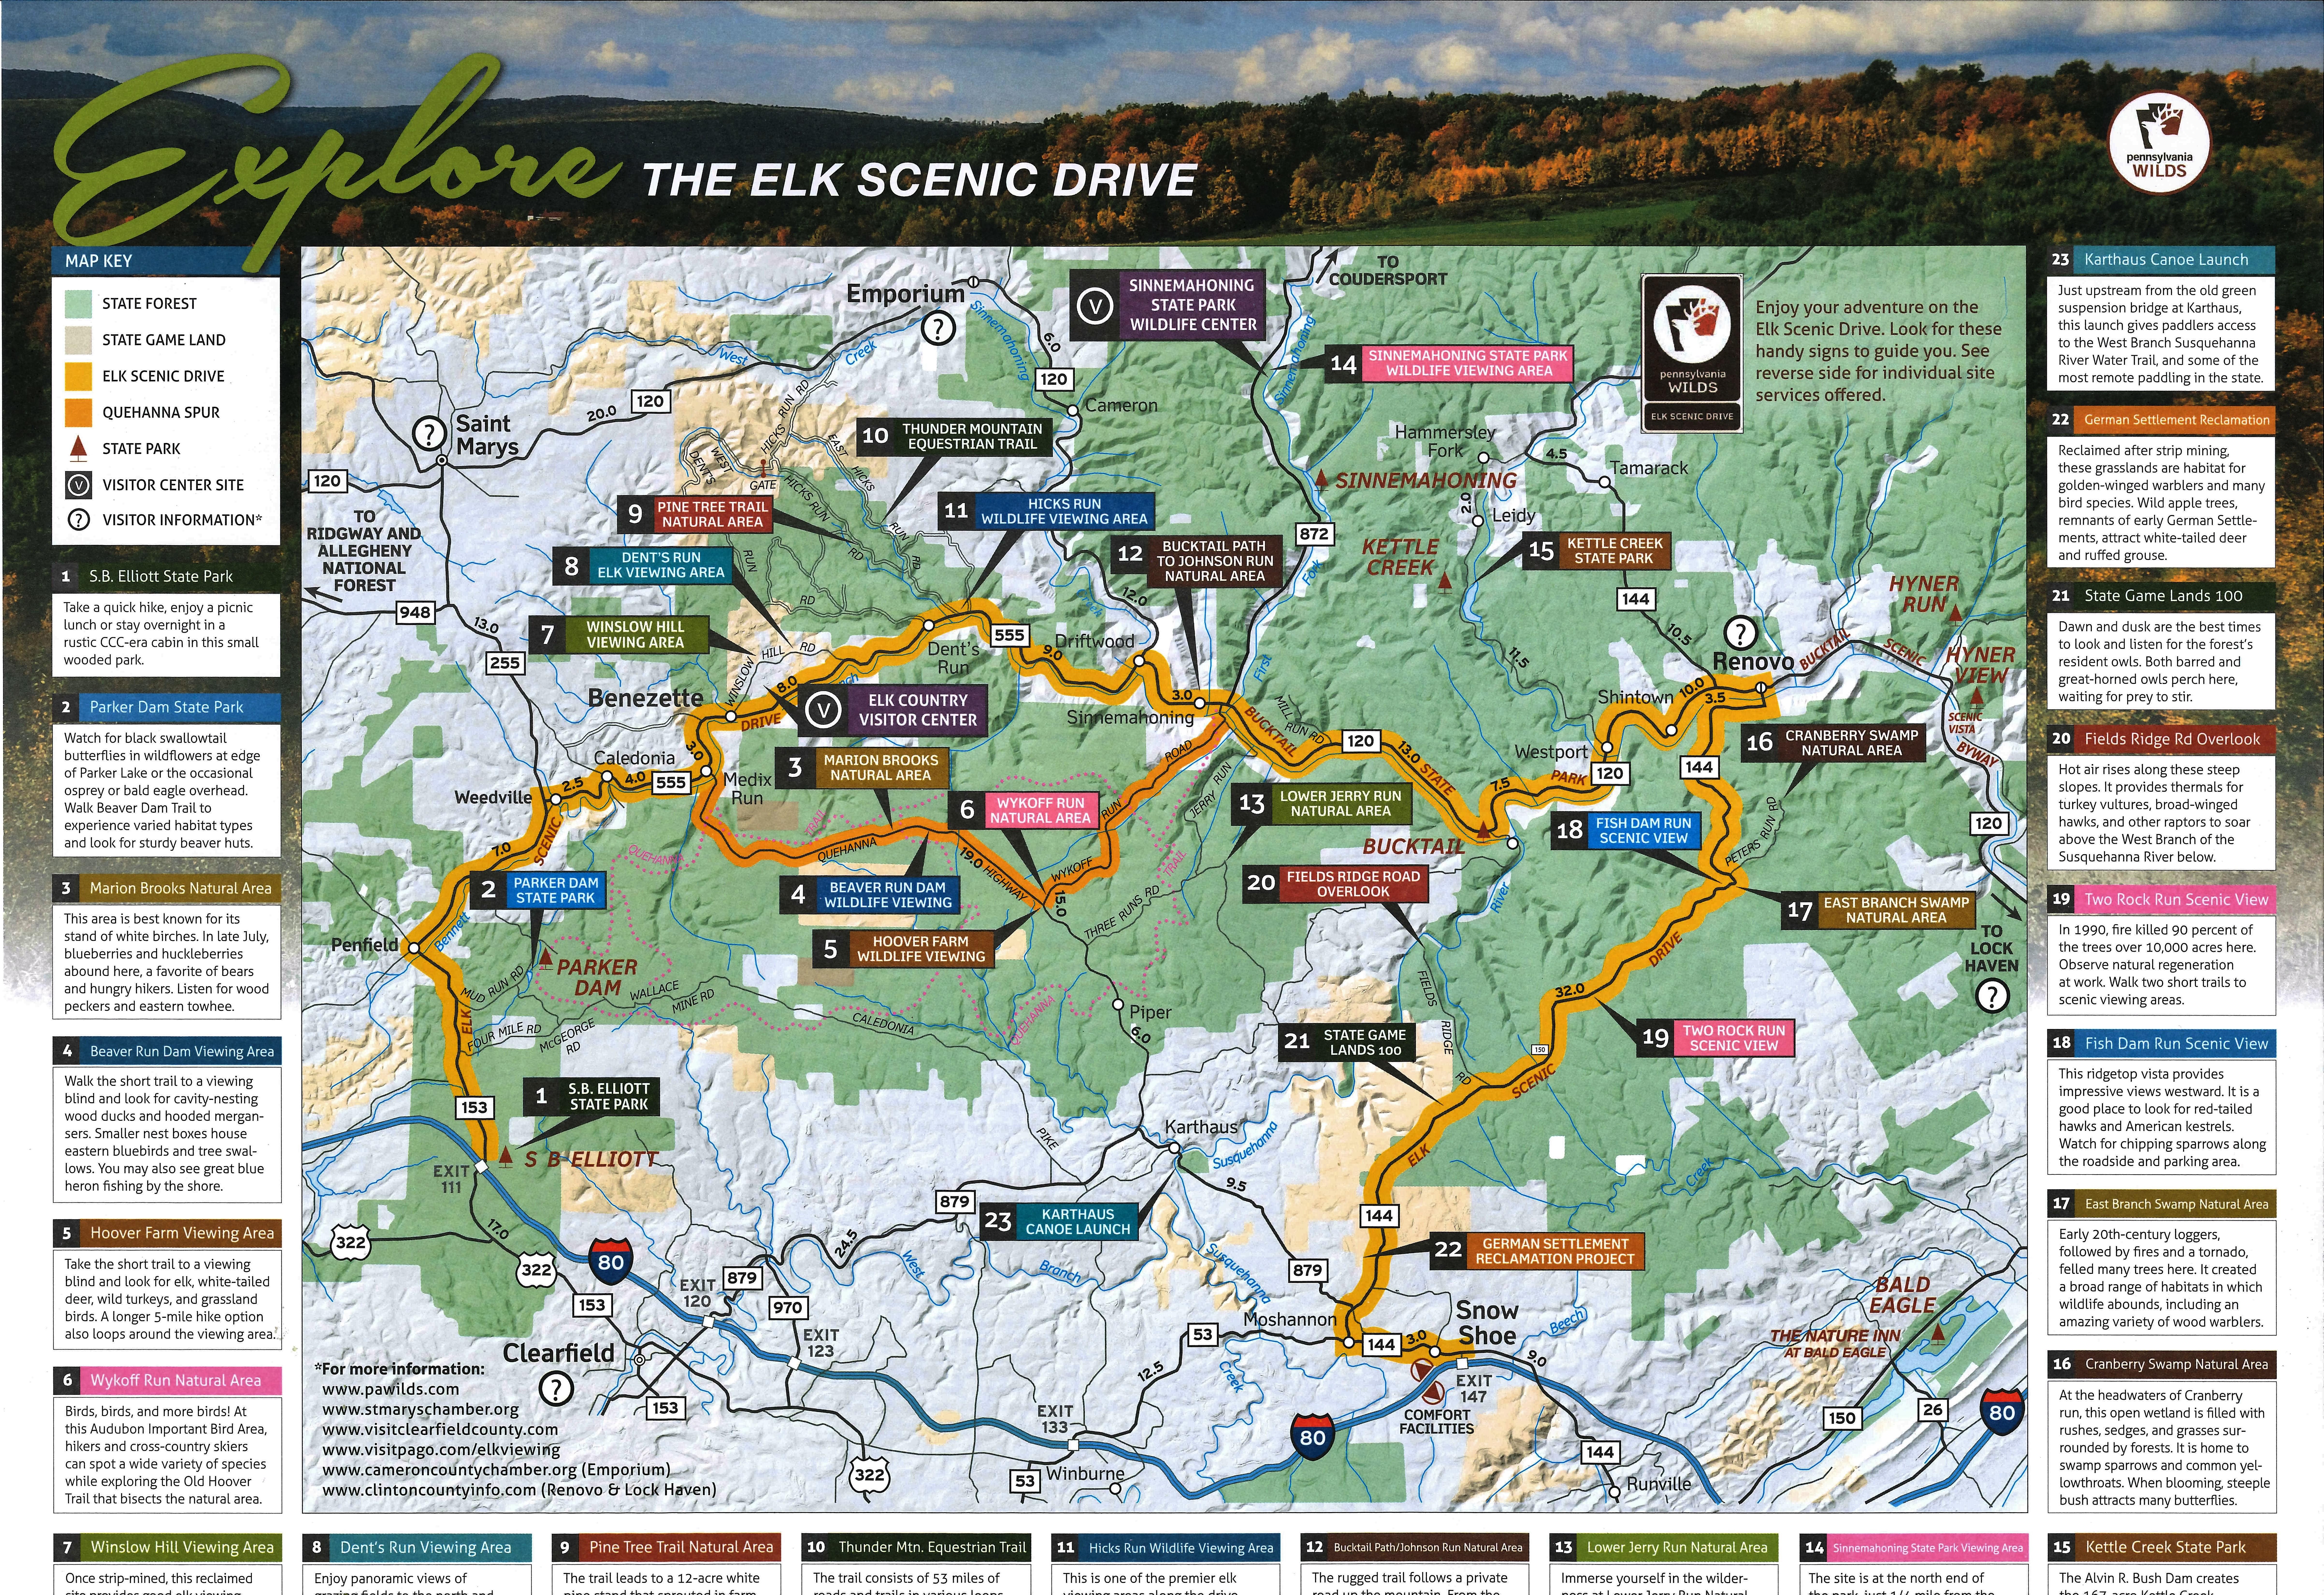 Drawn scenic go green Map Download Viewing Elk Elk